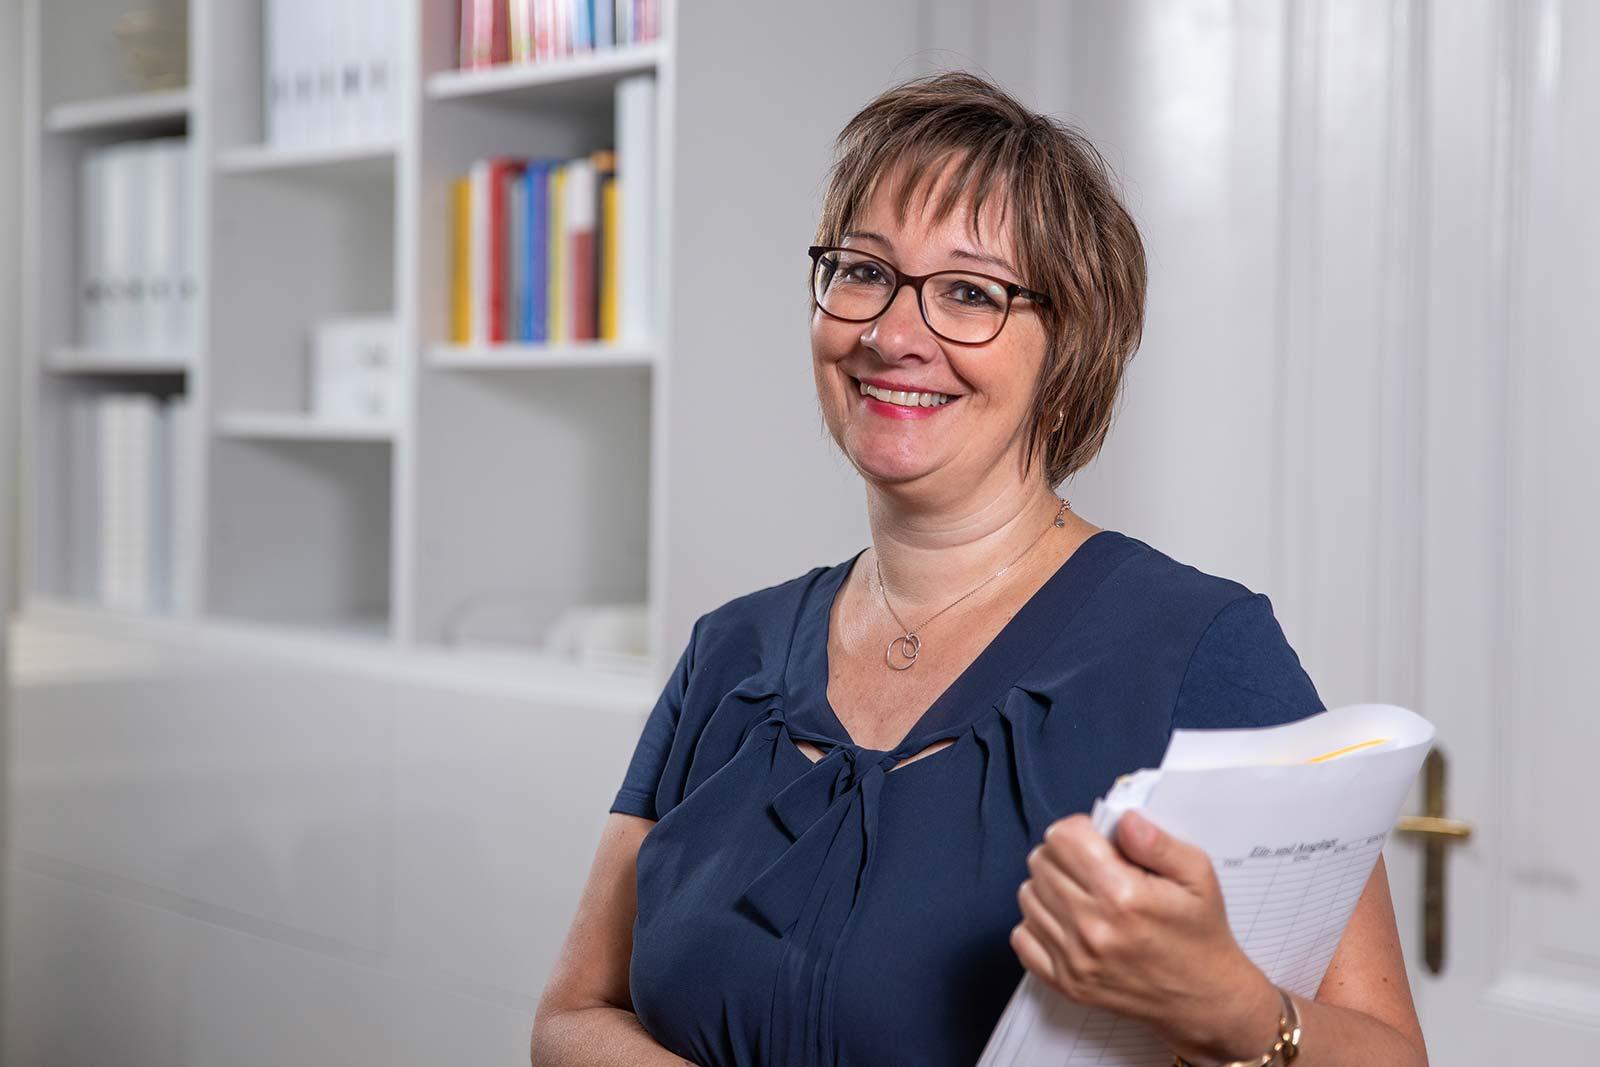 Birgit Maylandt | Fuchs Wenzel Ortner Richter Rechtsanwälte, 6020 Innsbruck